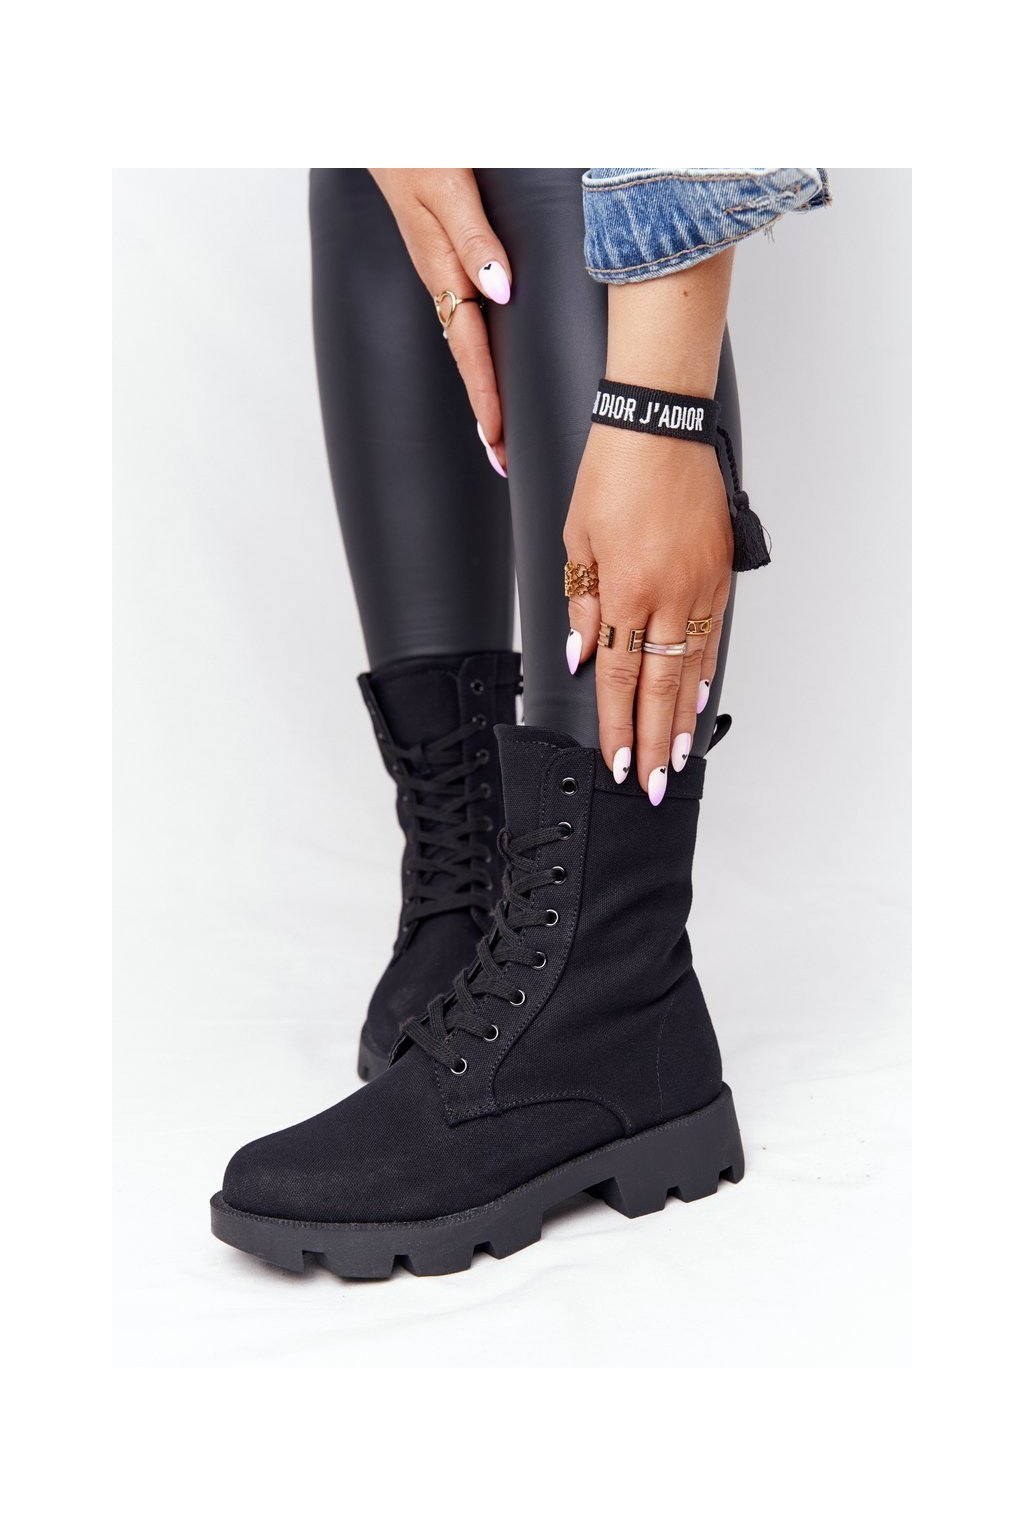 Členkové topánky na podpätku farba čierna NJSK 99-117 BLK